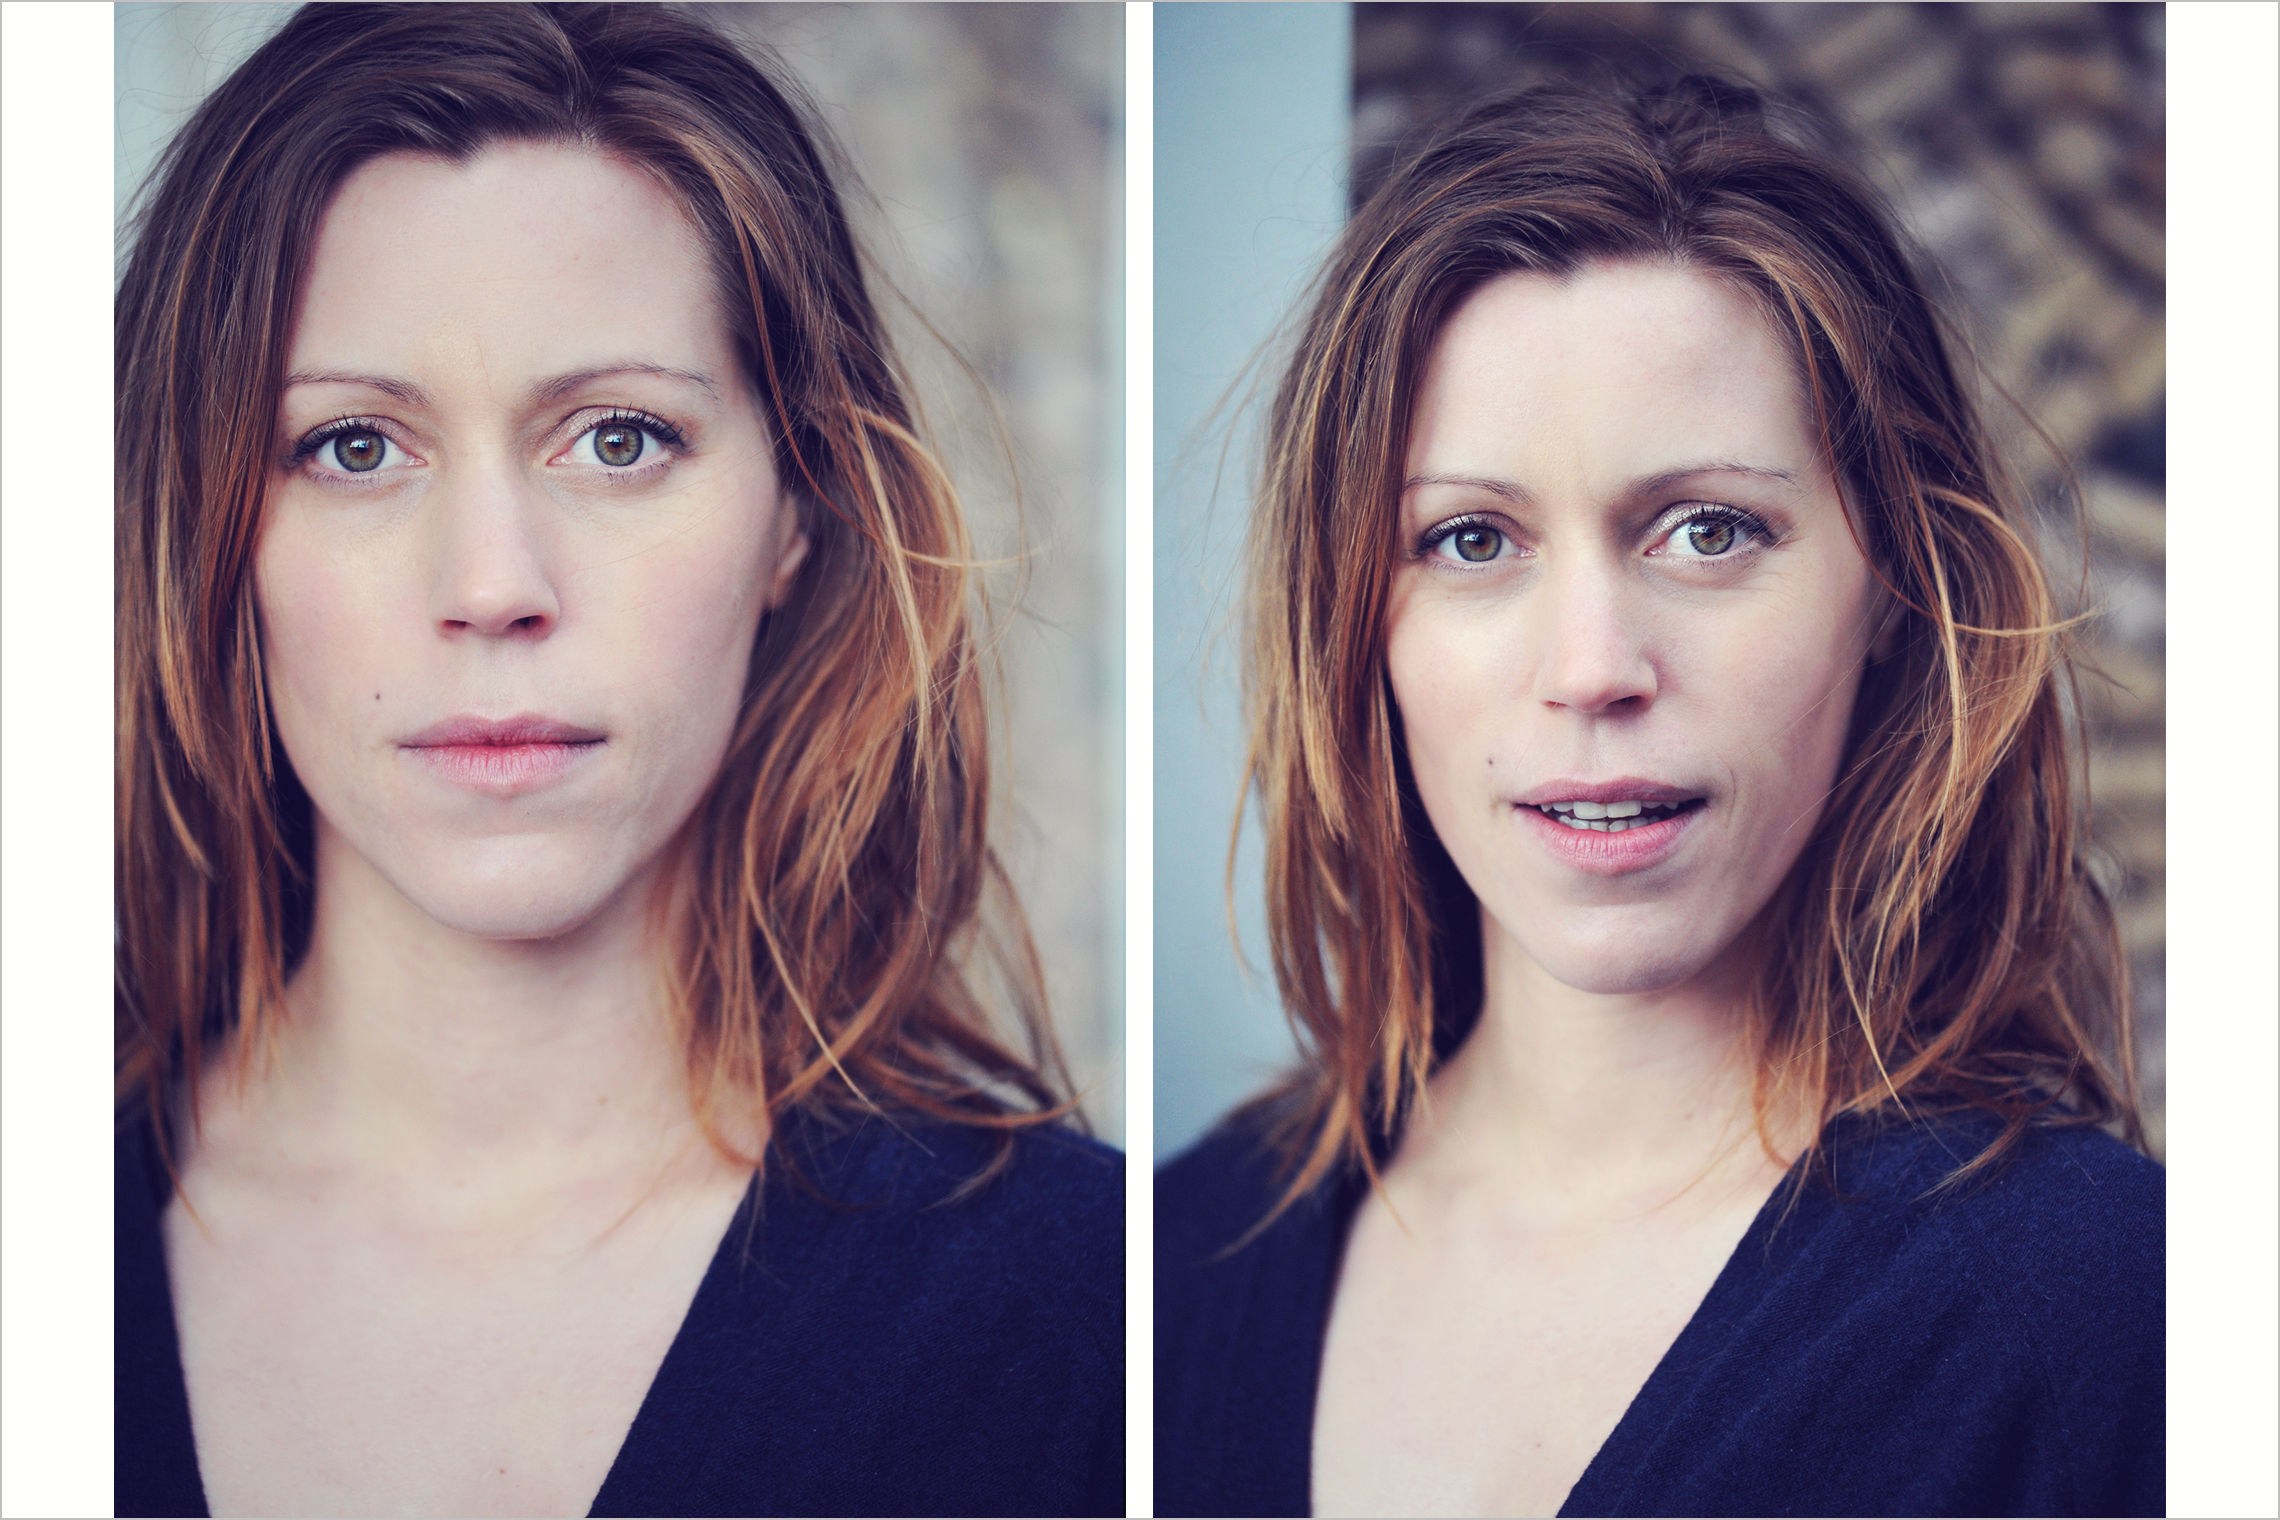 Portraitfotografie Schauspielerin Headshots Imagefotos Caro Hoene Photography Berlin Kreuzberg